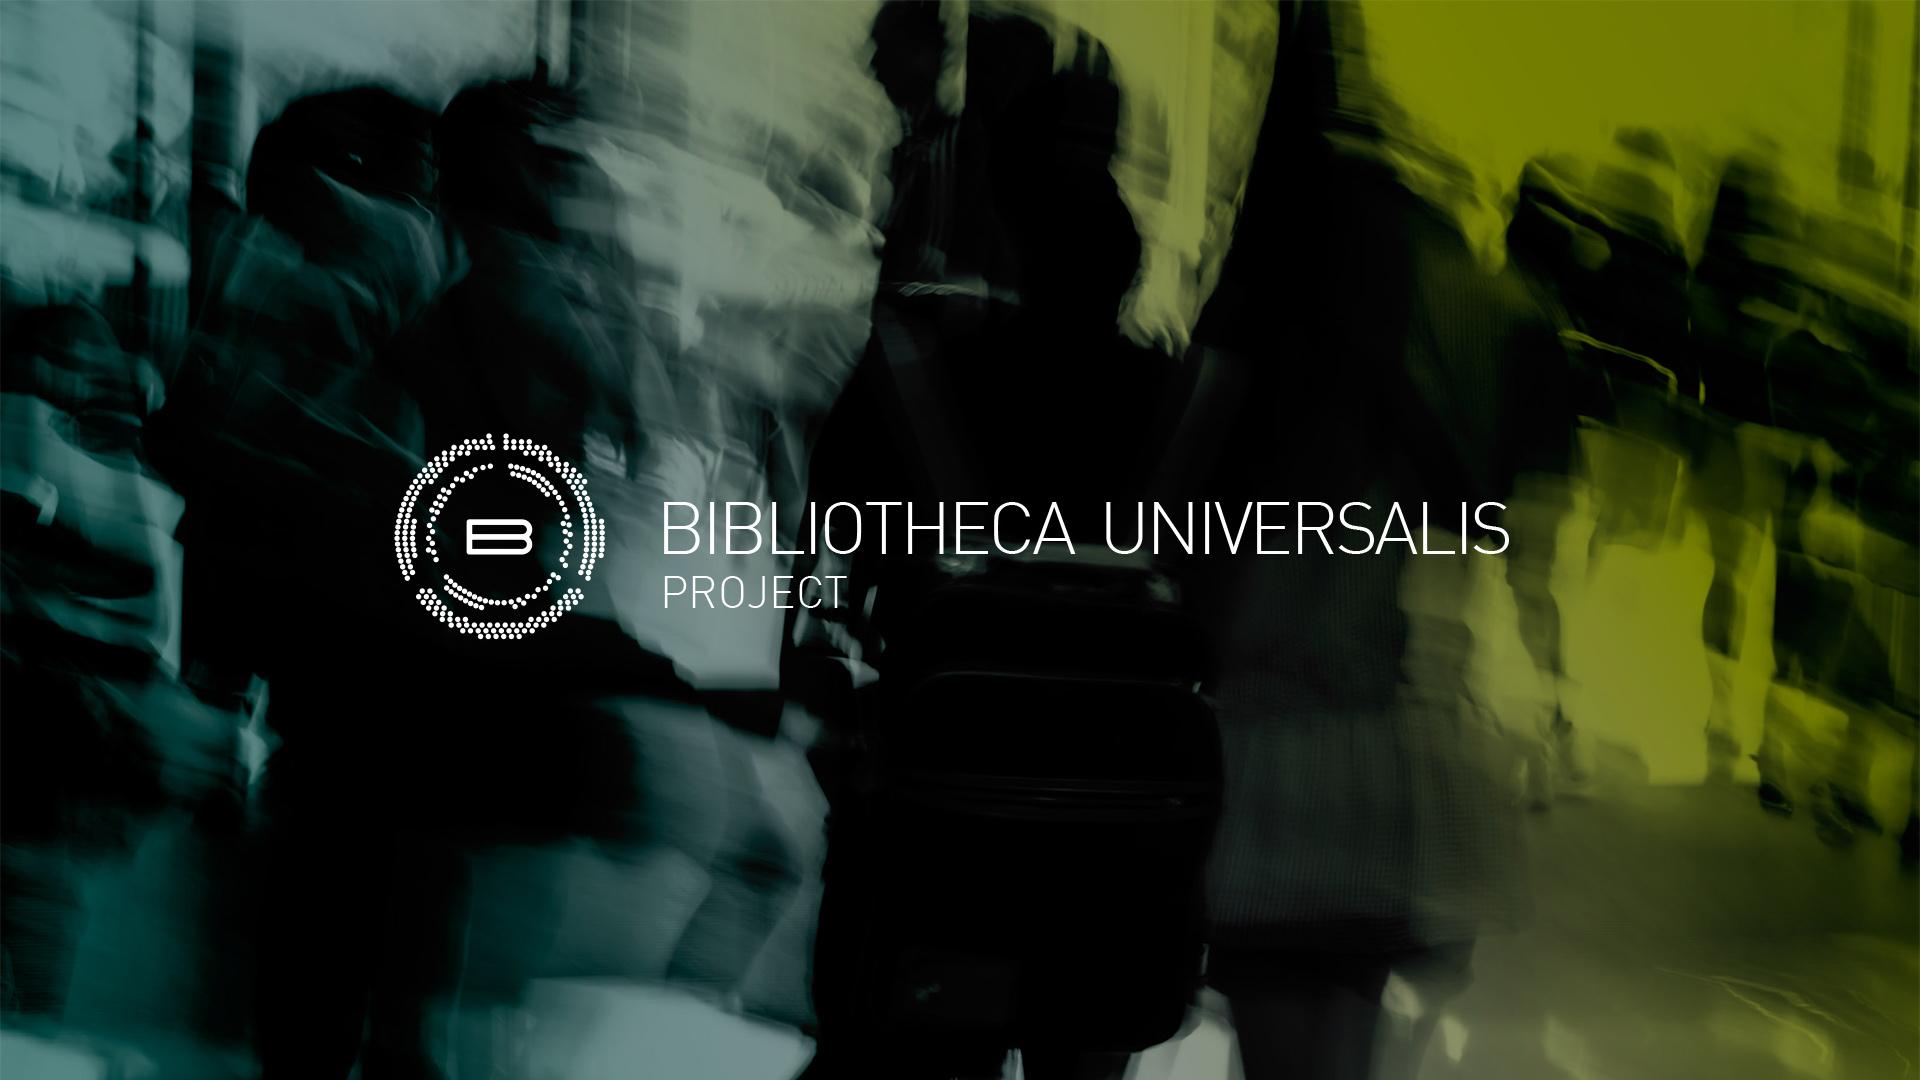 Bibliotheca Universalis Project